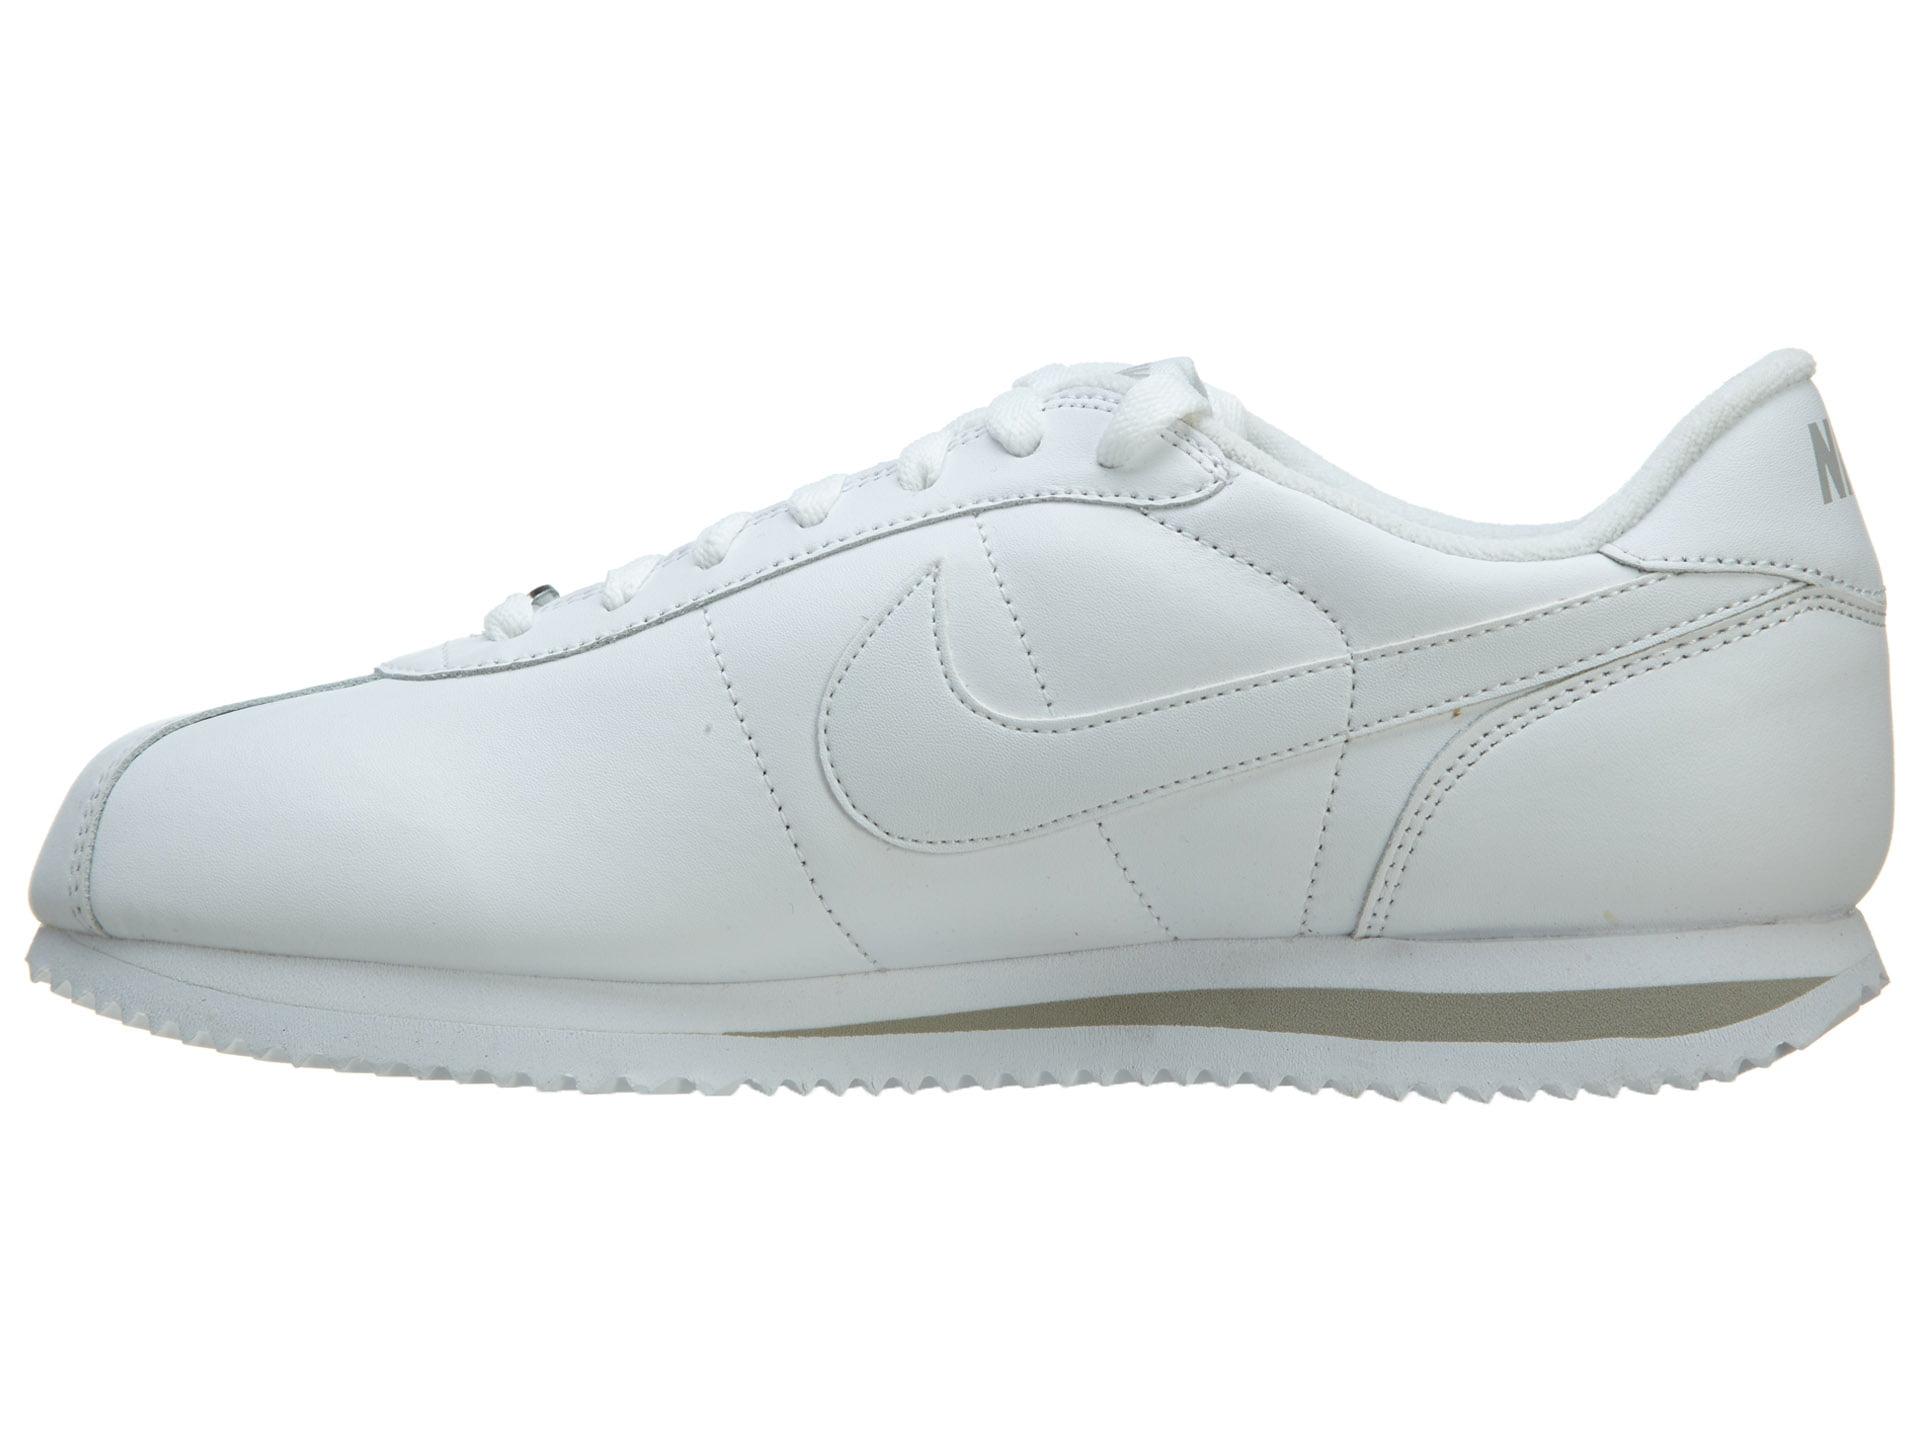 Nike Men's NIKE CORTEZ BASIC LEATHER '06 CASUAL SHOES 11 (WHITE/WHITE/LIGHT ZEN GREY)